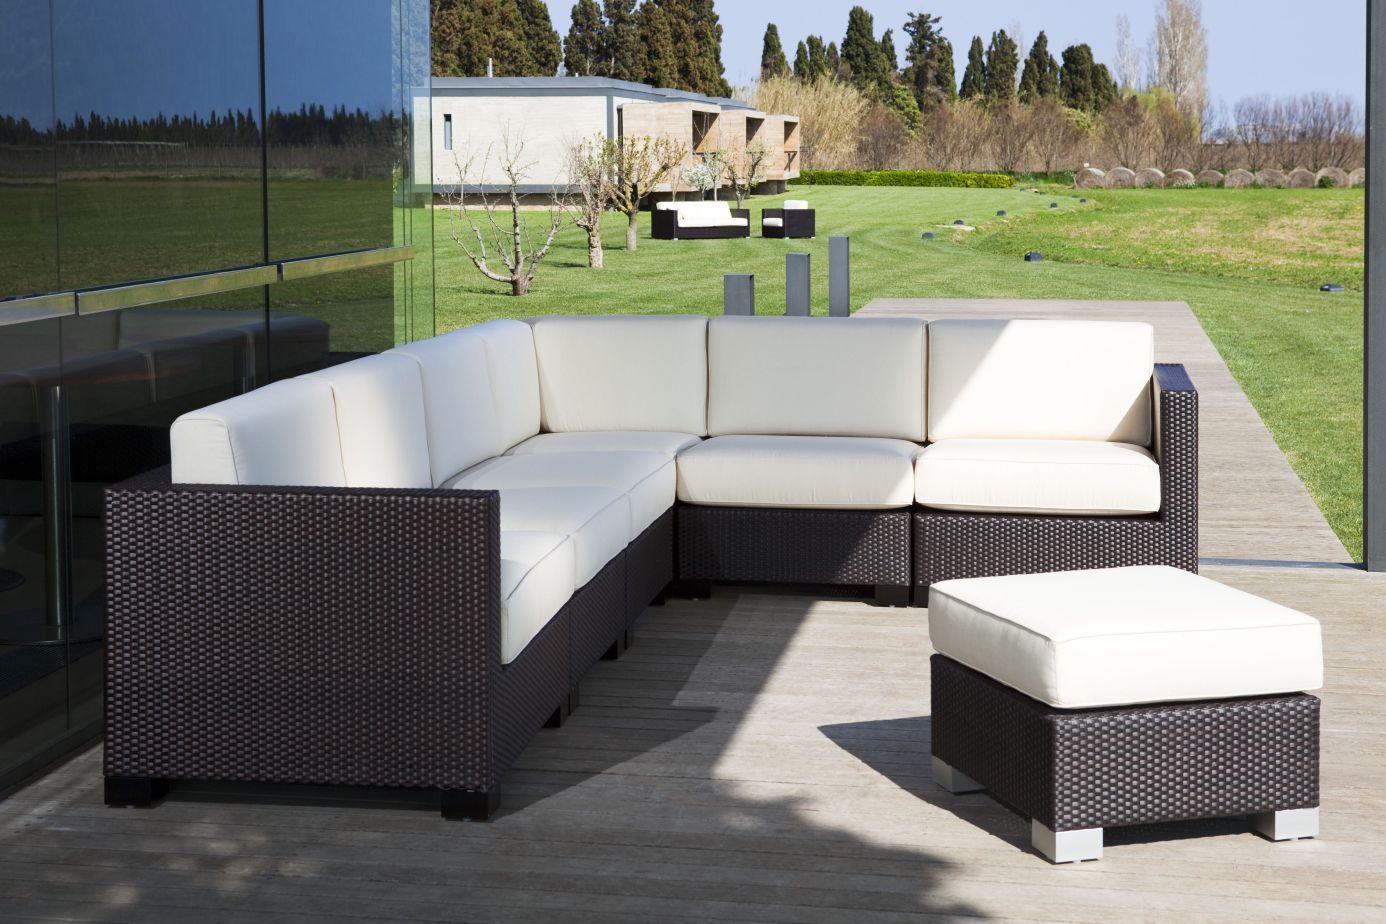 Te presento distintos muebles de exterior (mesas, sofás, tumbonas ...